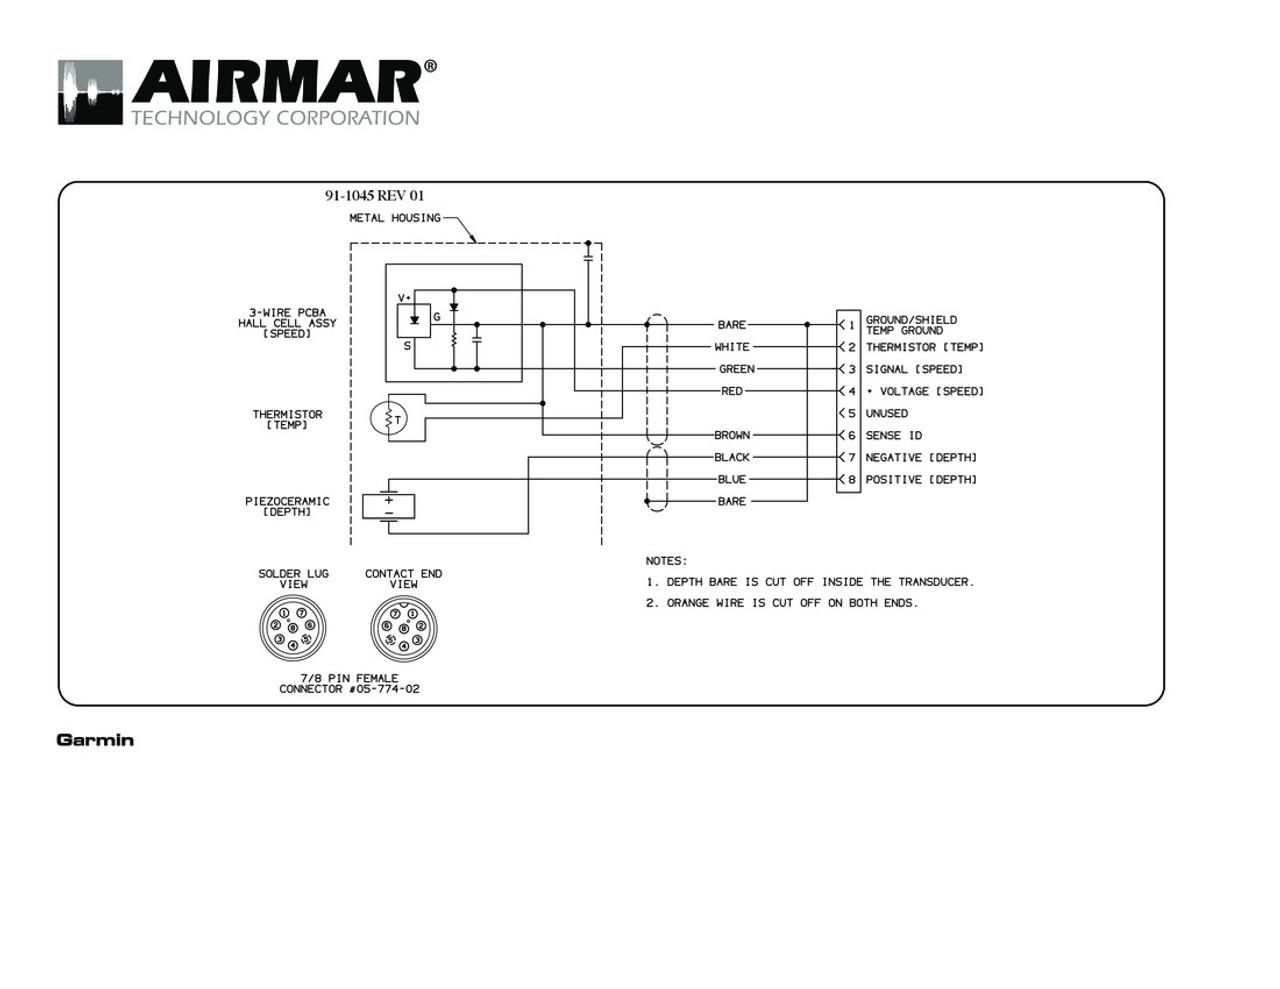 Garmin 5212 Wiring Diagram | Wiring Diagram on